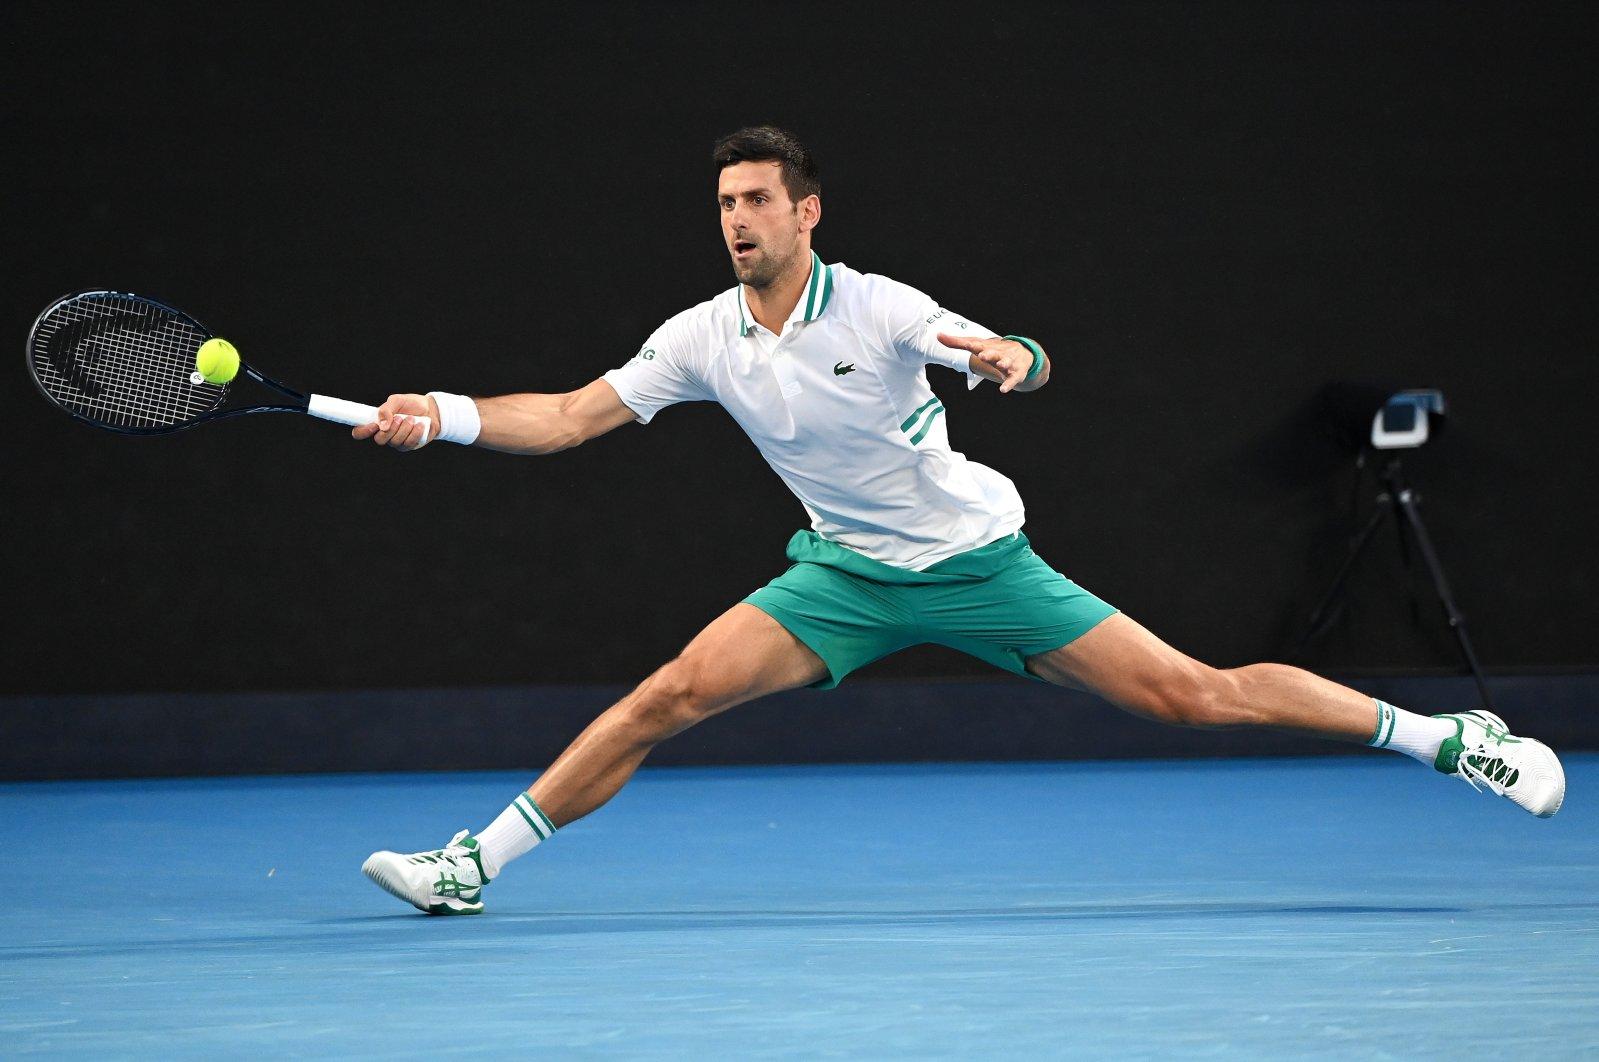 Serbia's Novak Djokovic in action against Russia's Aslan Karatsev in the Australian Open men's singles semifinal at Melbourne Park, Melbourne, Feb. 18, 2021. (EPA Photo)